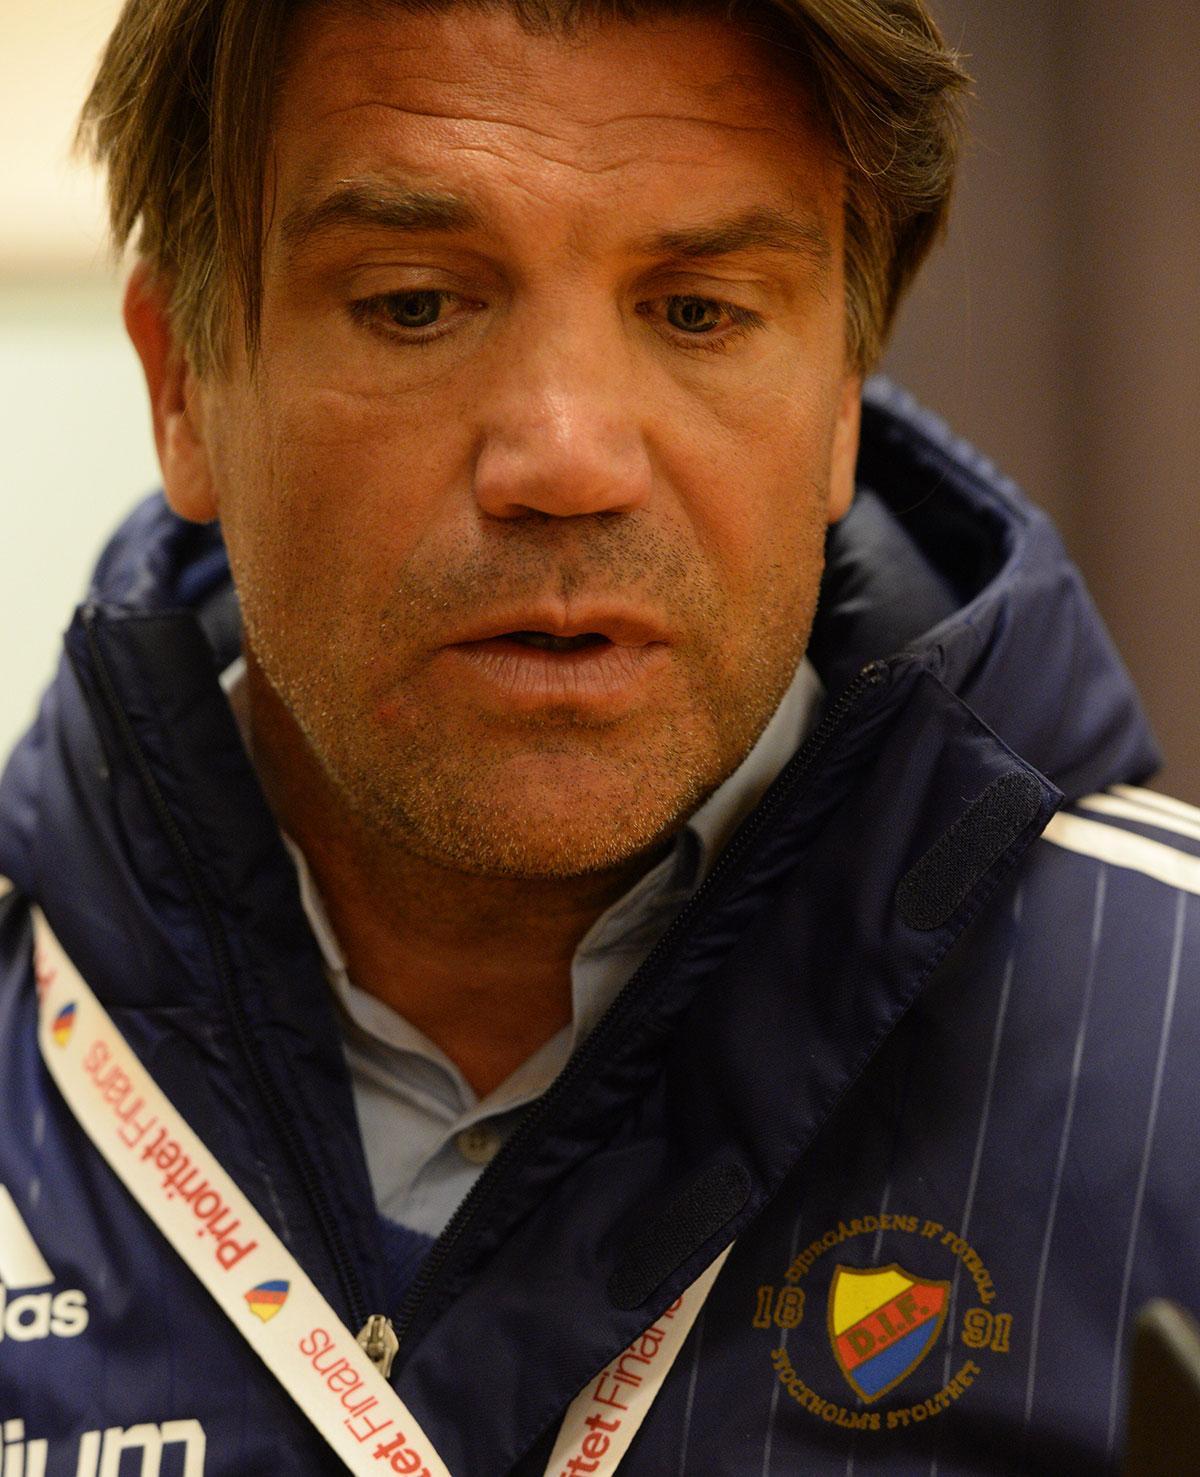 Bosse Andersson efter derbyförlusten.